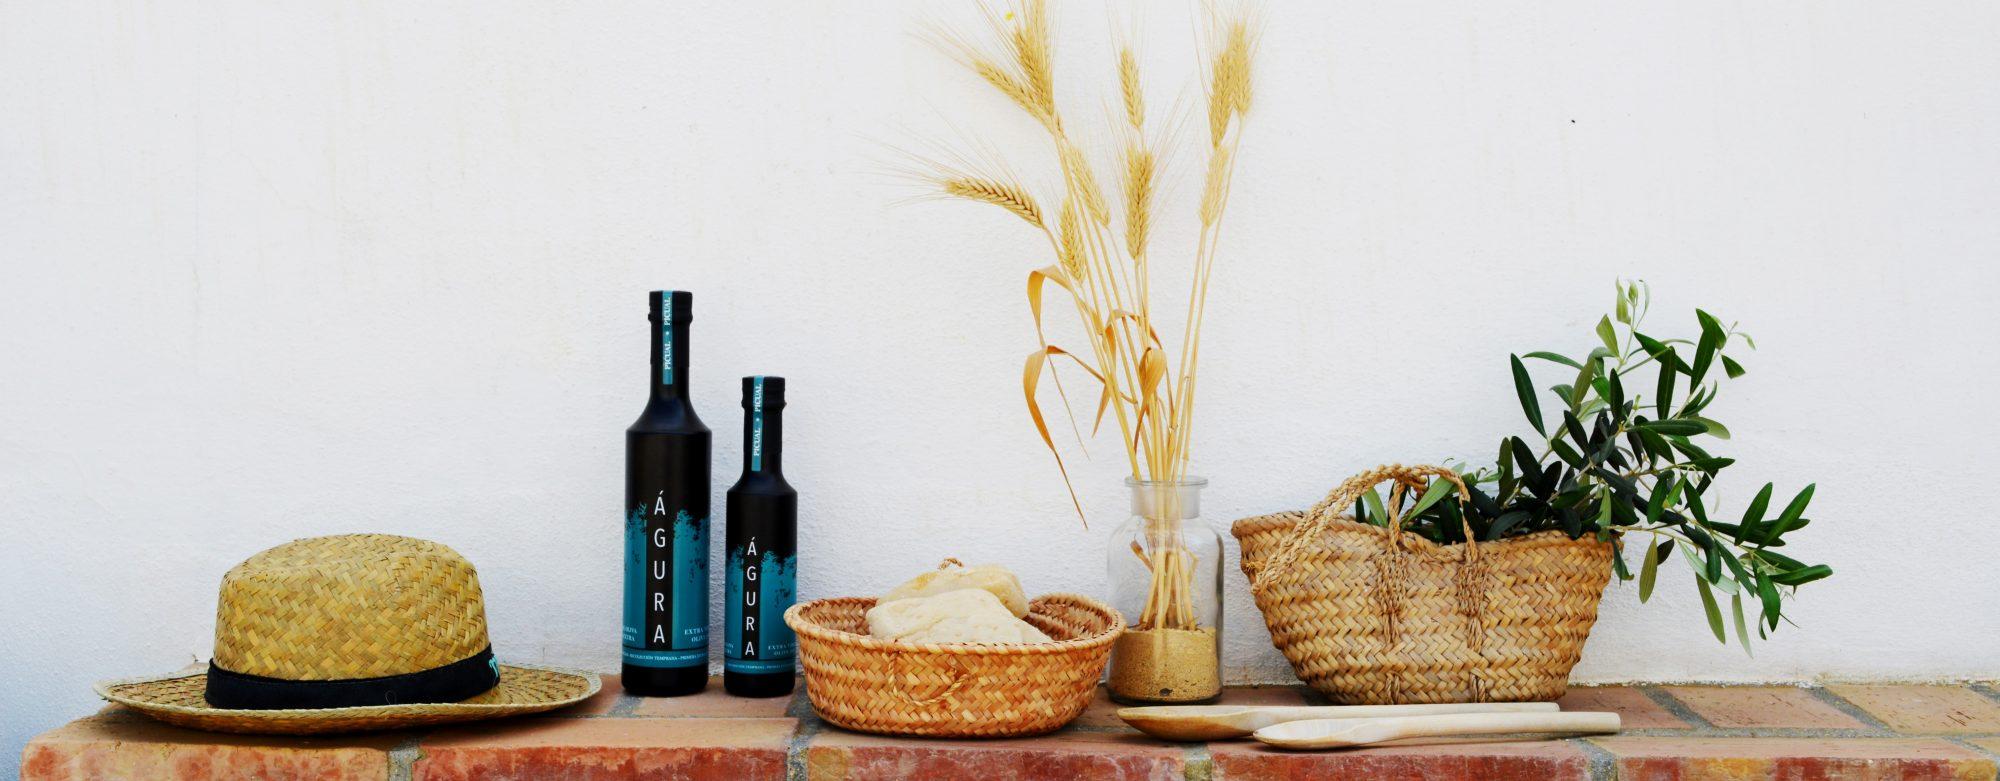 aceite de oliva agura